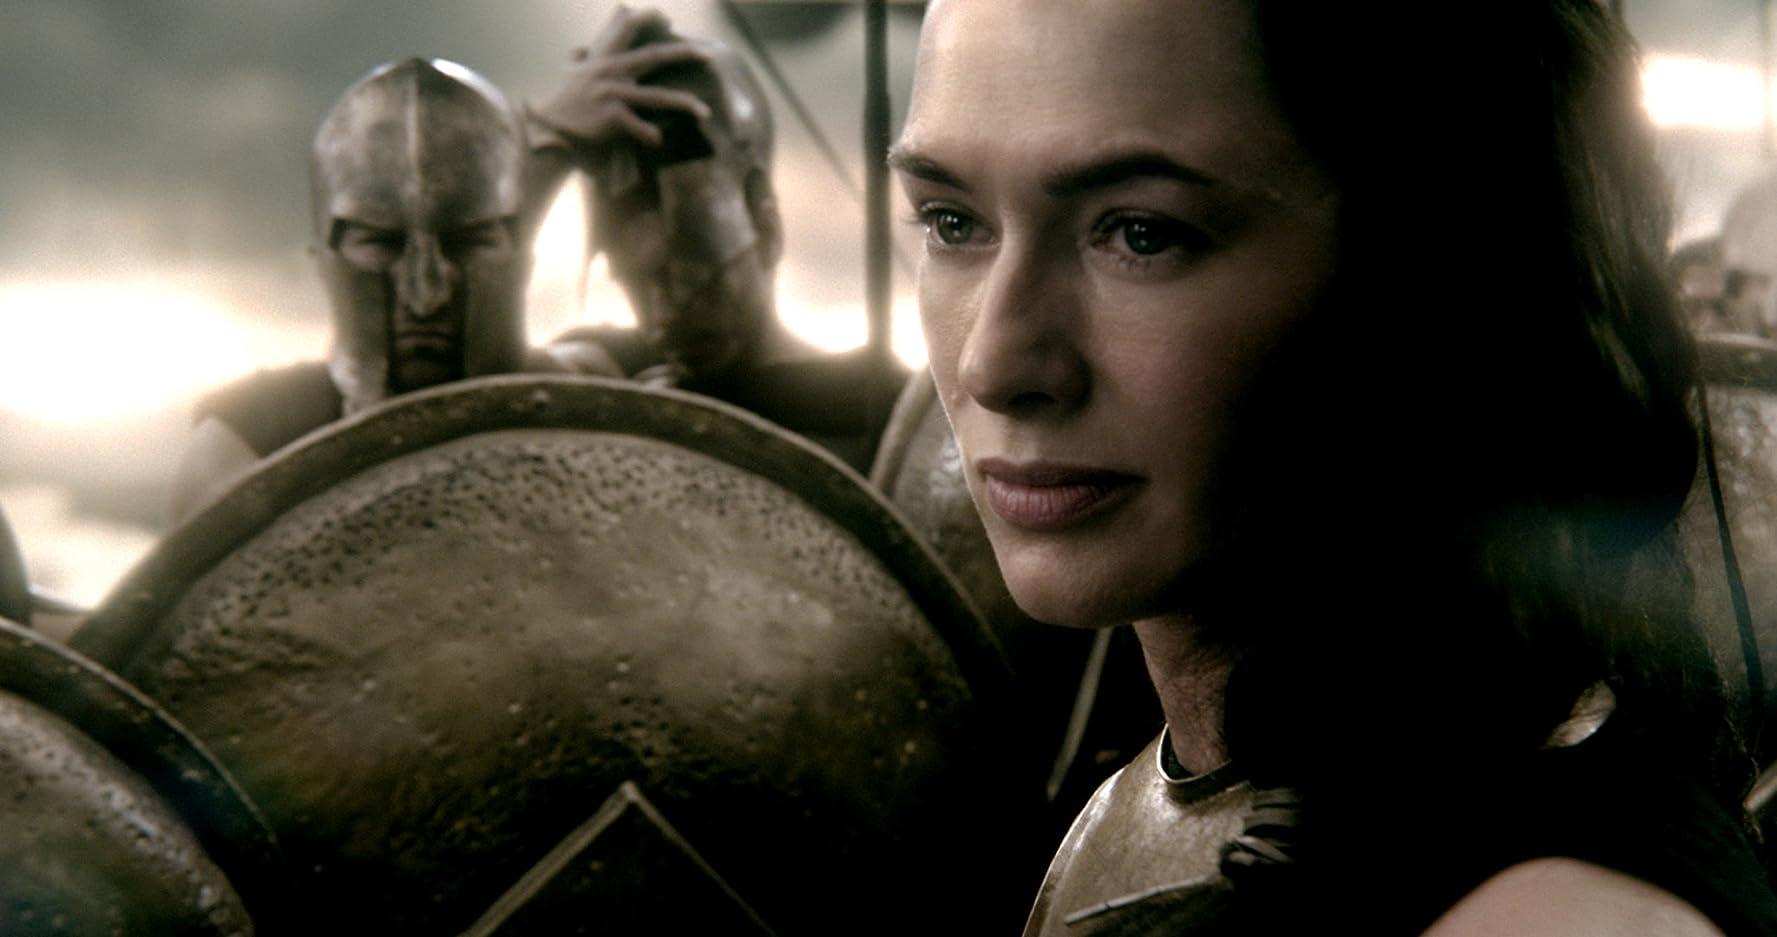 Lena Headey in 300: Rise of an Empire (2014)